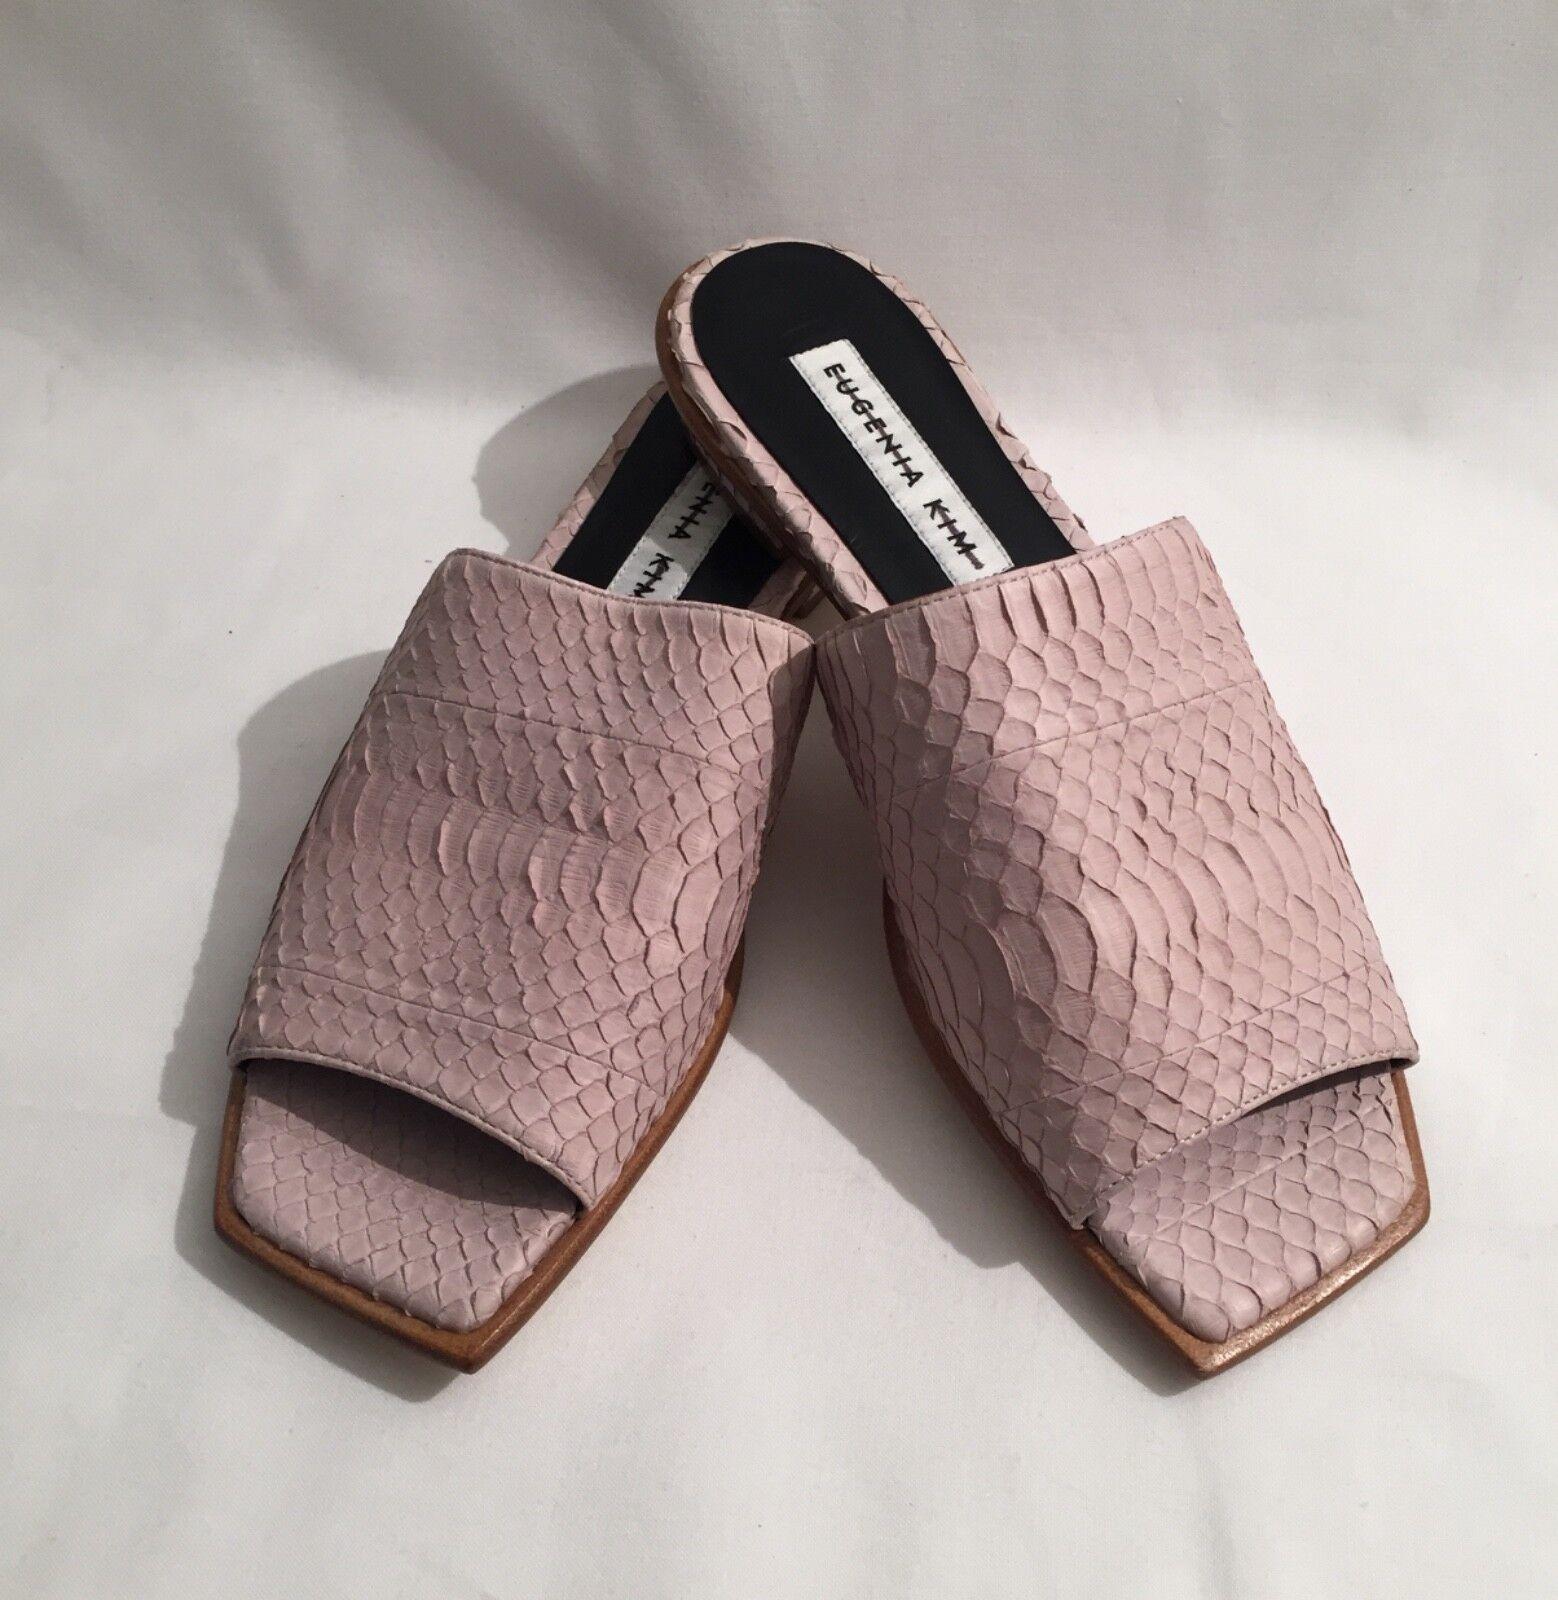 Eugenia Kim Lourdes Petal Pink Snakeskin Textured Leather Flat Slides Sandals 36